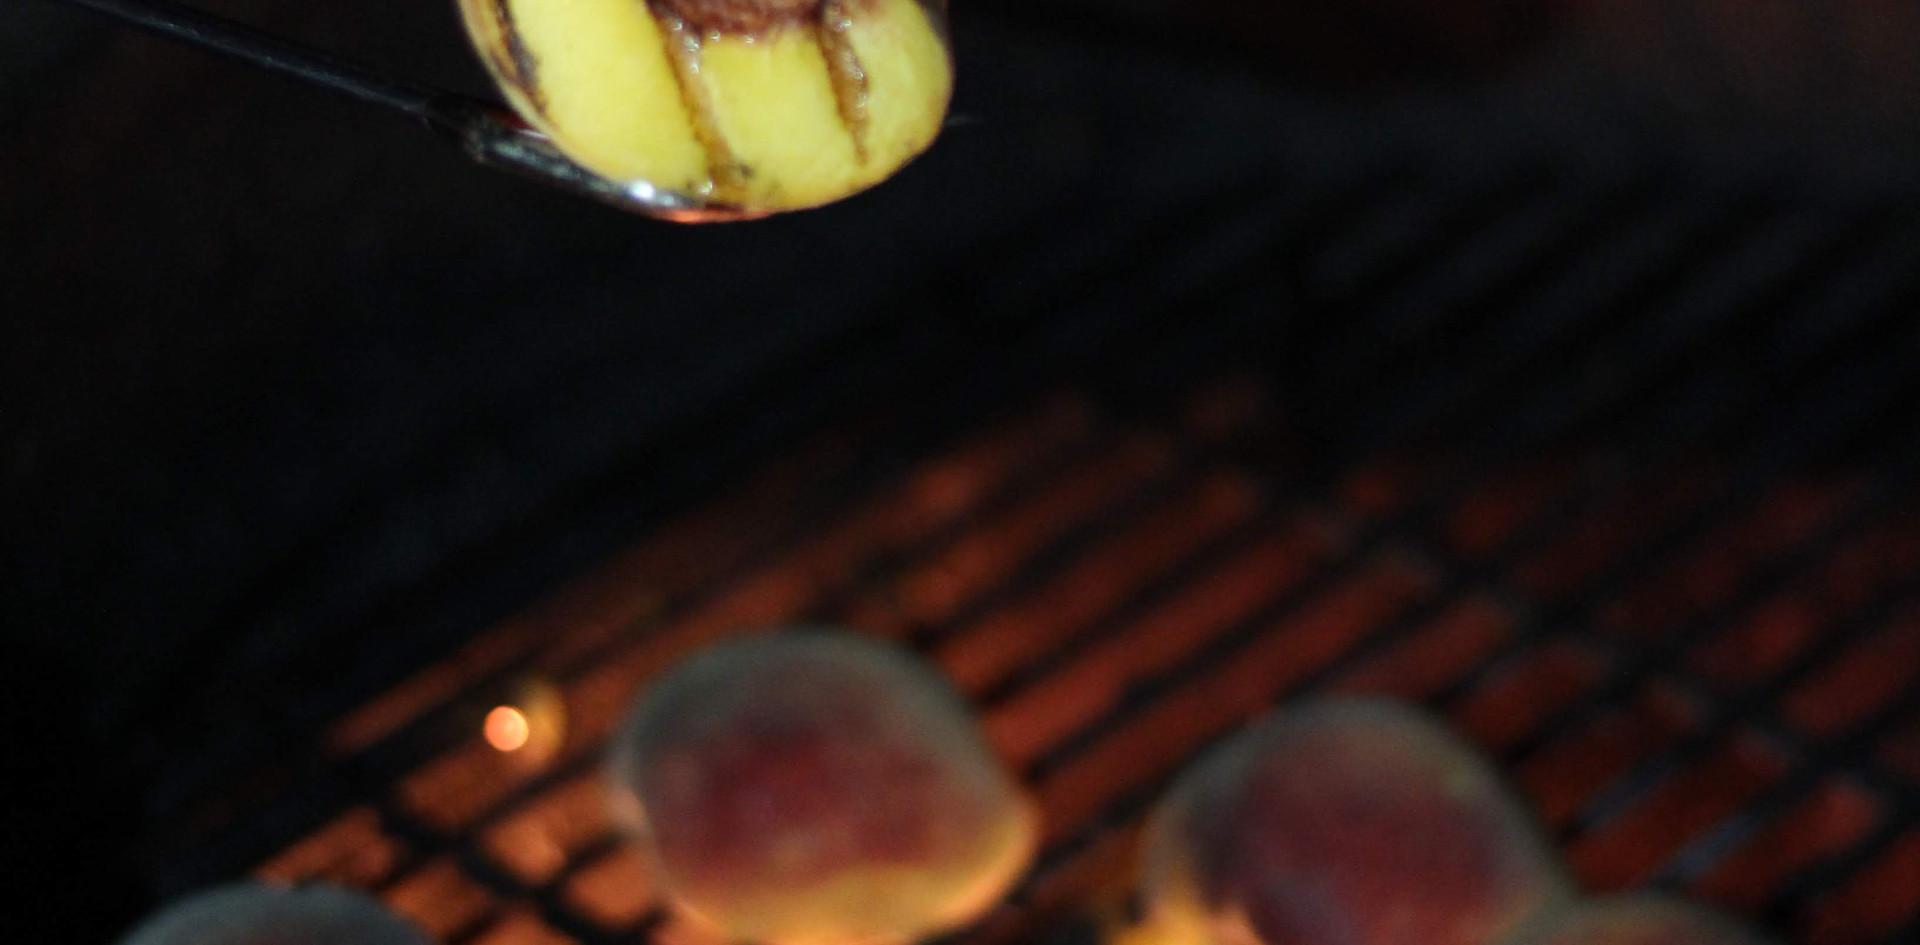 leprechauno-peaches-on-the-grill-5.jpg